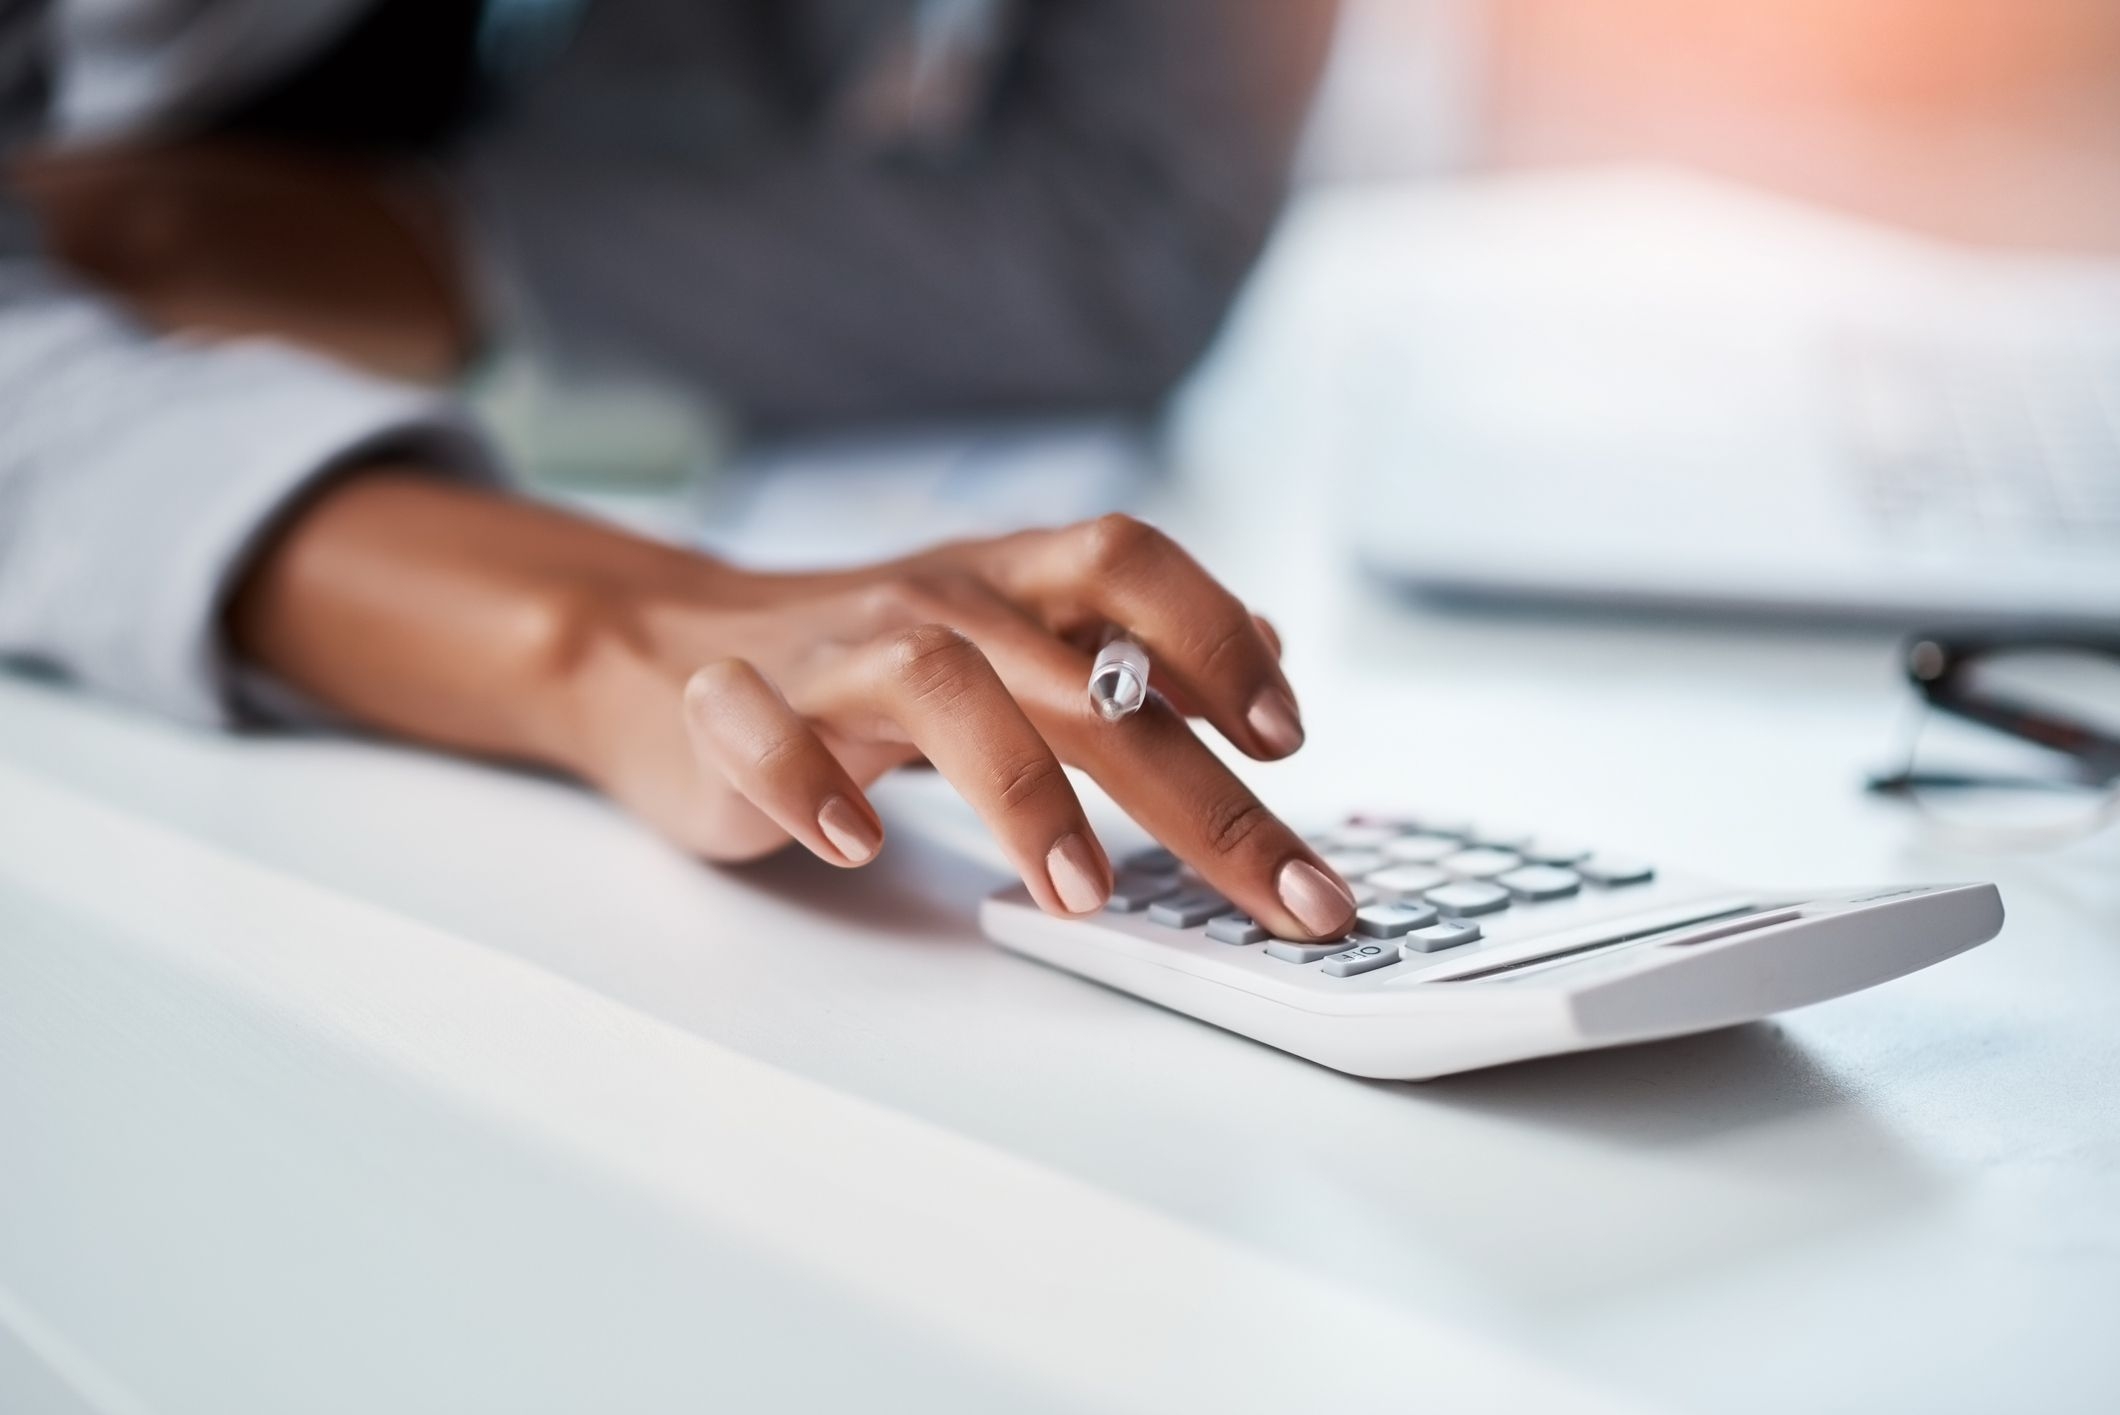 Woman's hand using a calculator